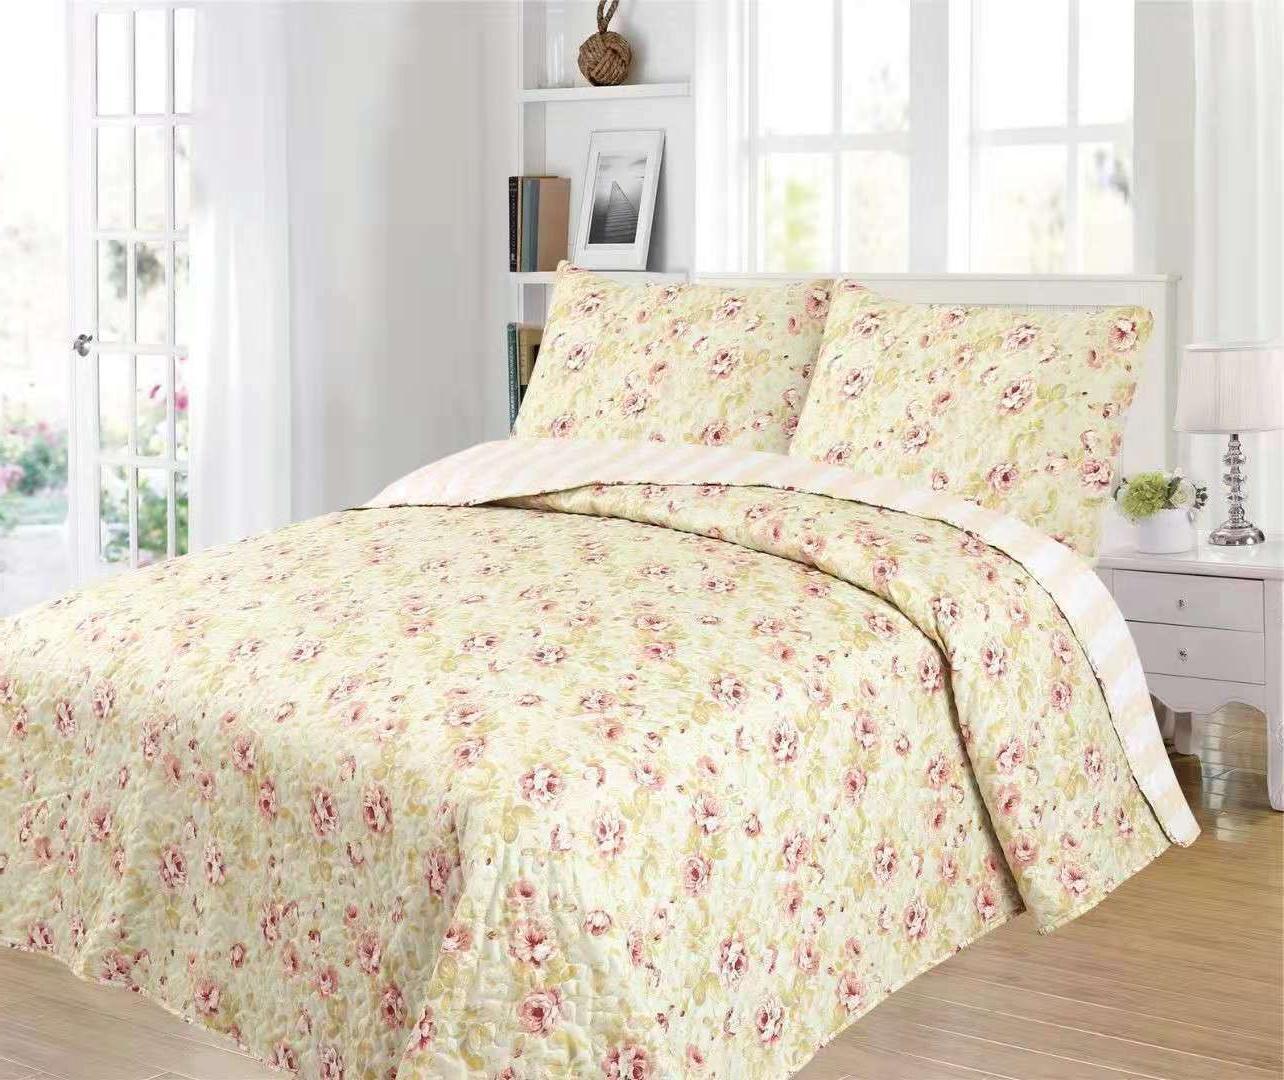 3 Piece King Size Quilt w/ Pillow shams